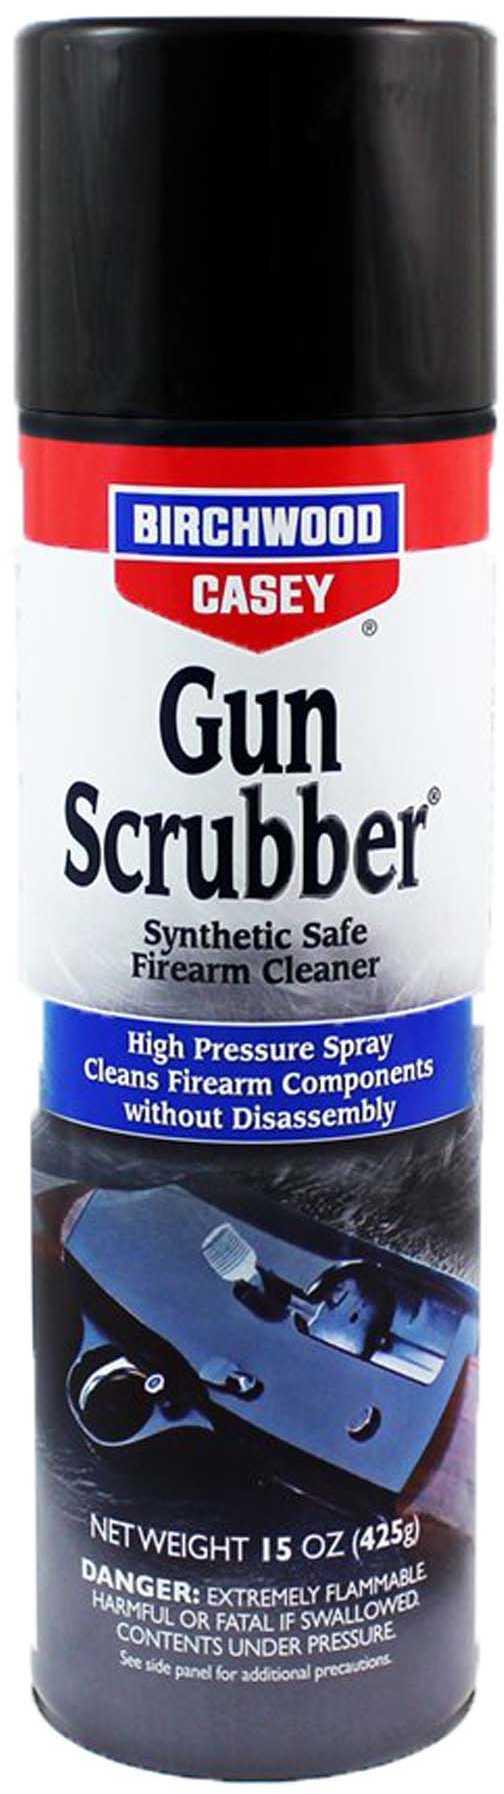 Birchwood Casey Gun Scrubber Firearms Cleaner 15 Oz. Aerosol Md: 33348